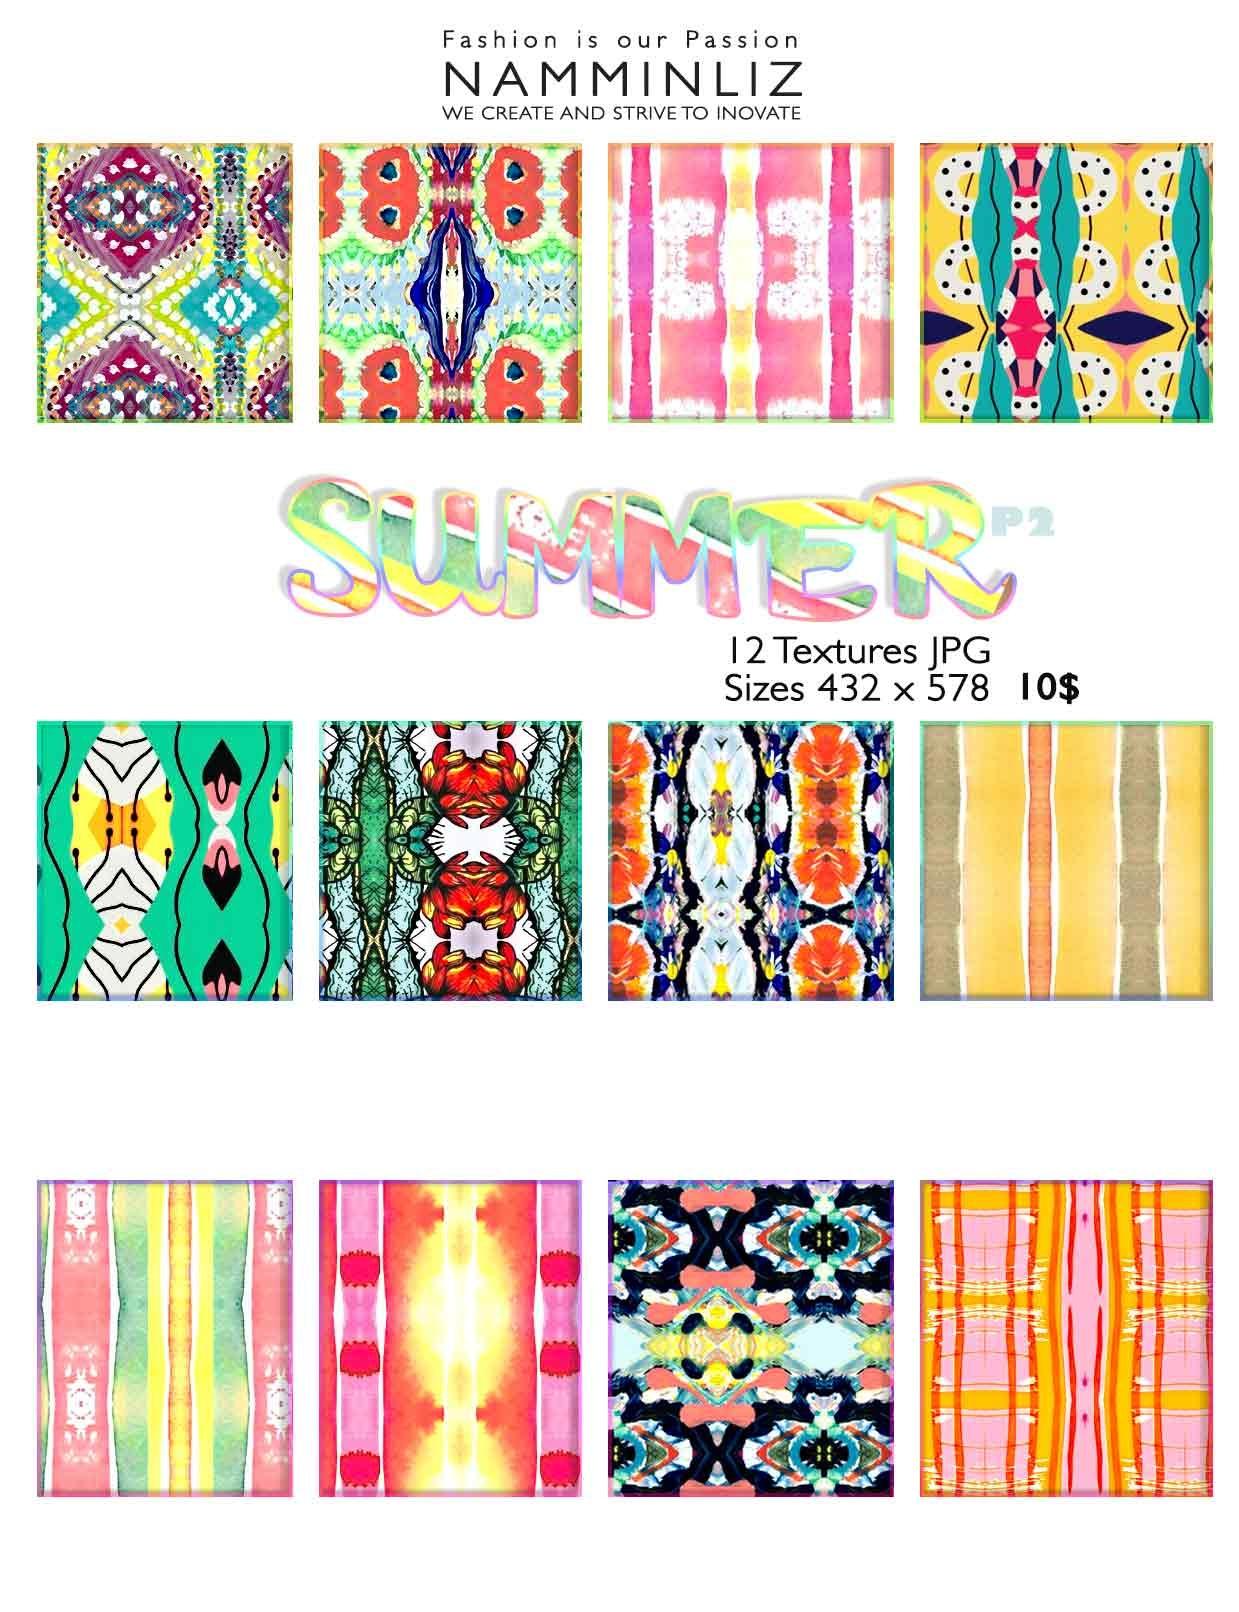 Summer Textures P2  • 12 Textures JPG imvu NAMMINLIZ